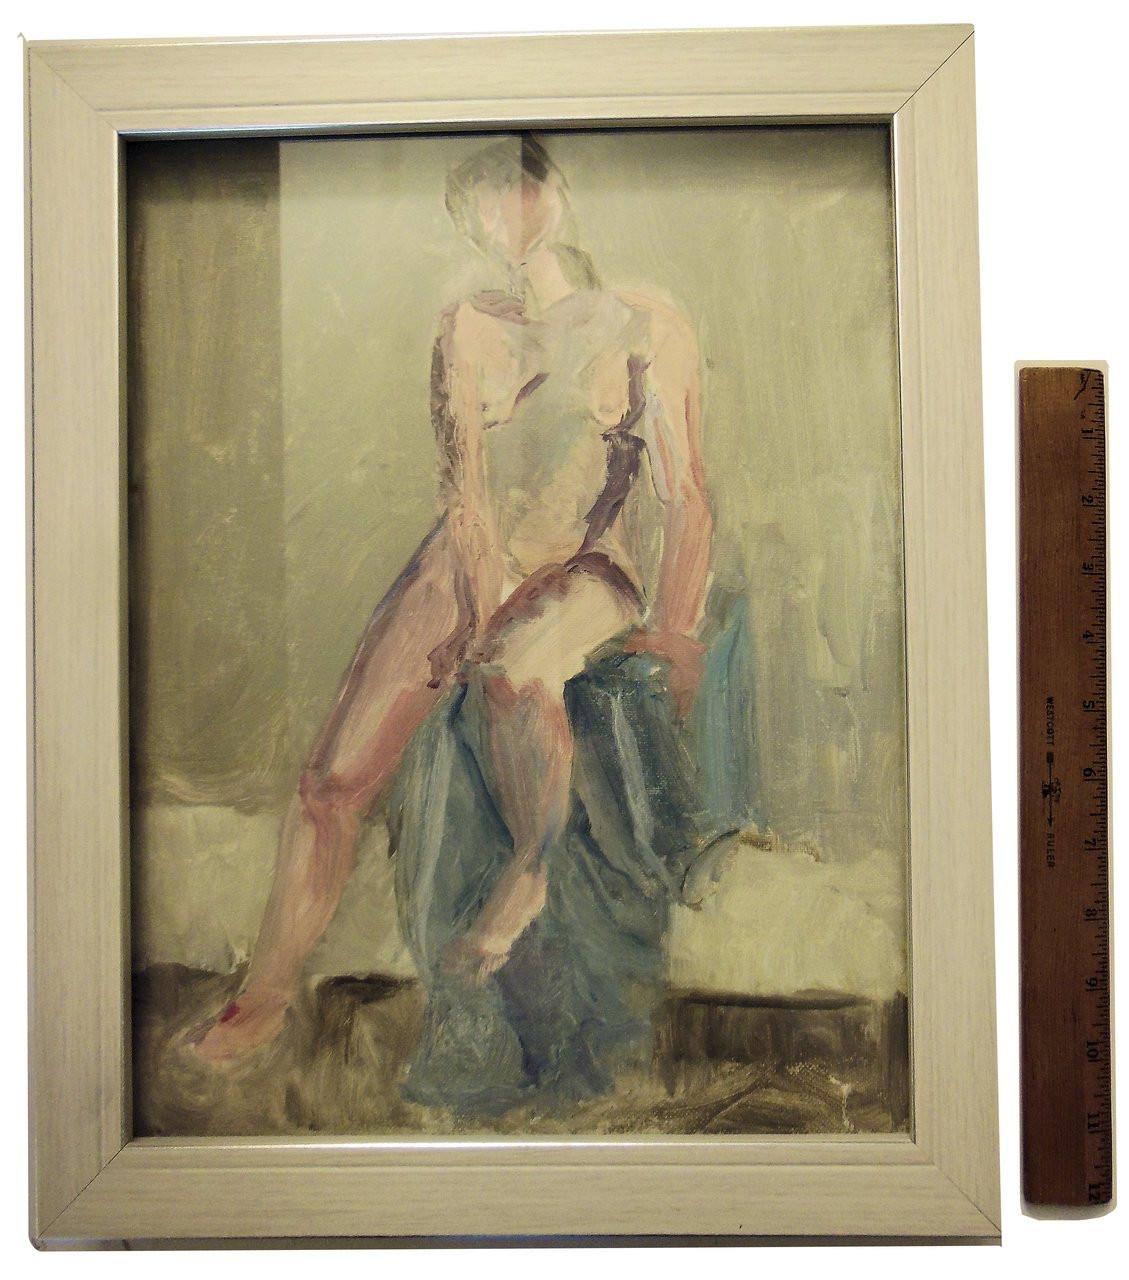 """Morning"" Nude Oil Painting, Tamara S. Gordon, Framed in Shadow Box"